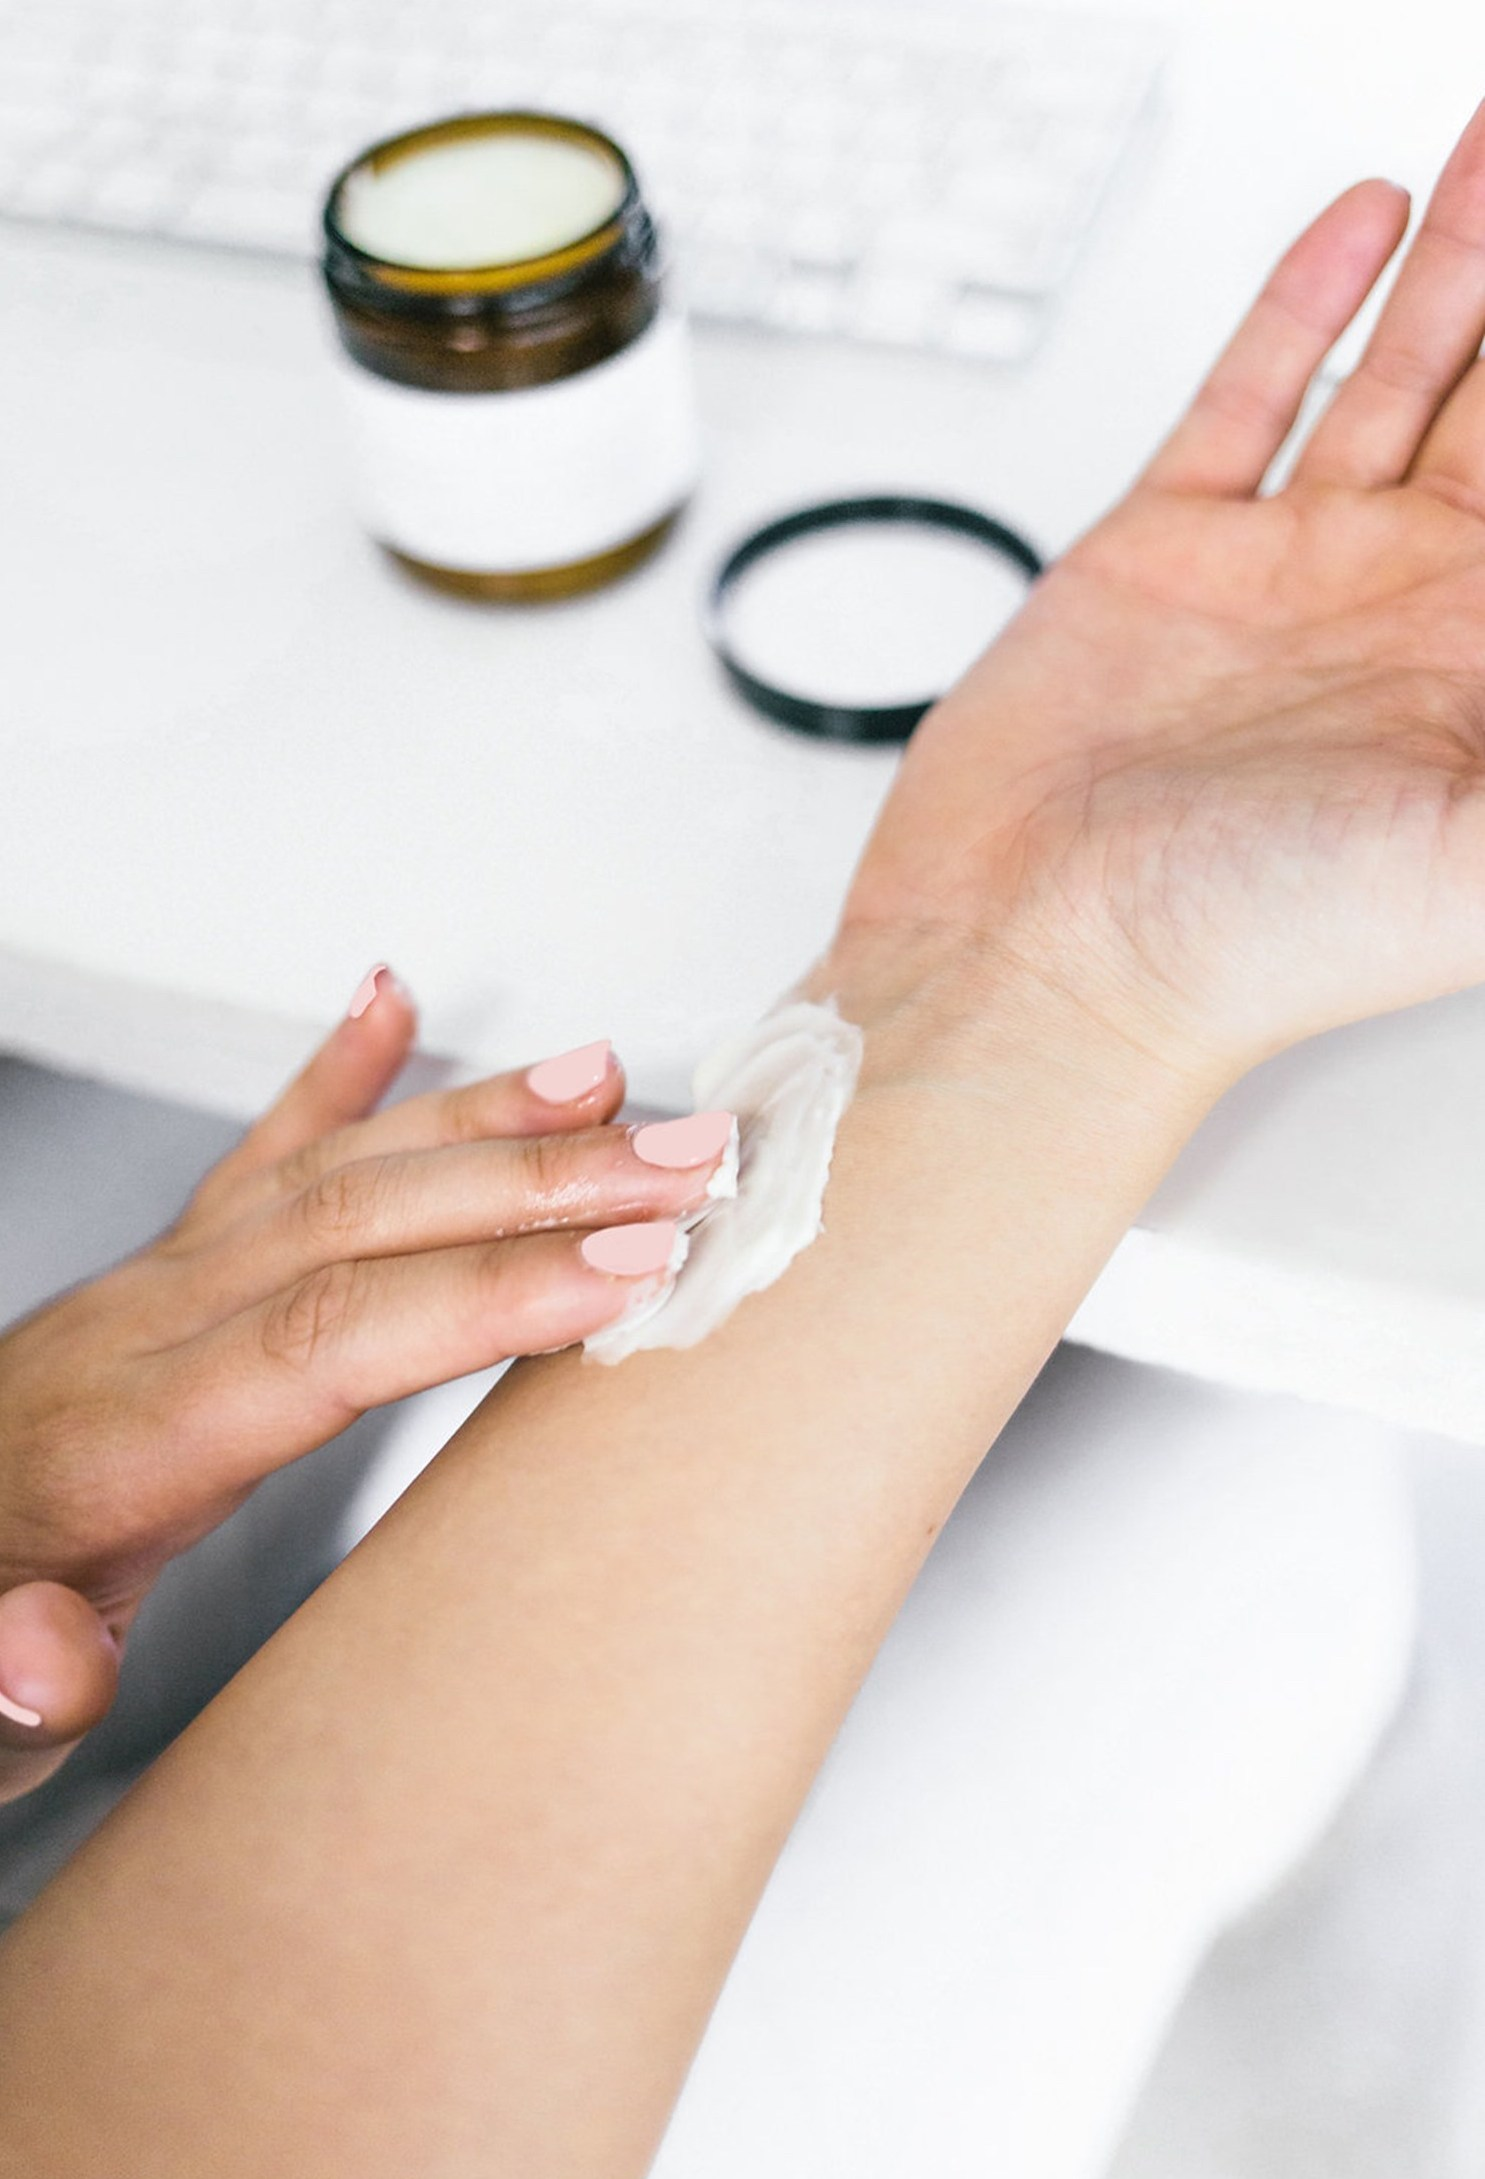 Tips-To-Moisturize-Skin-Naturally-Primally-Pure-Skincare.jpg